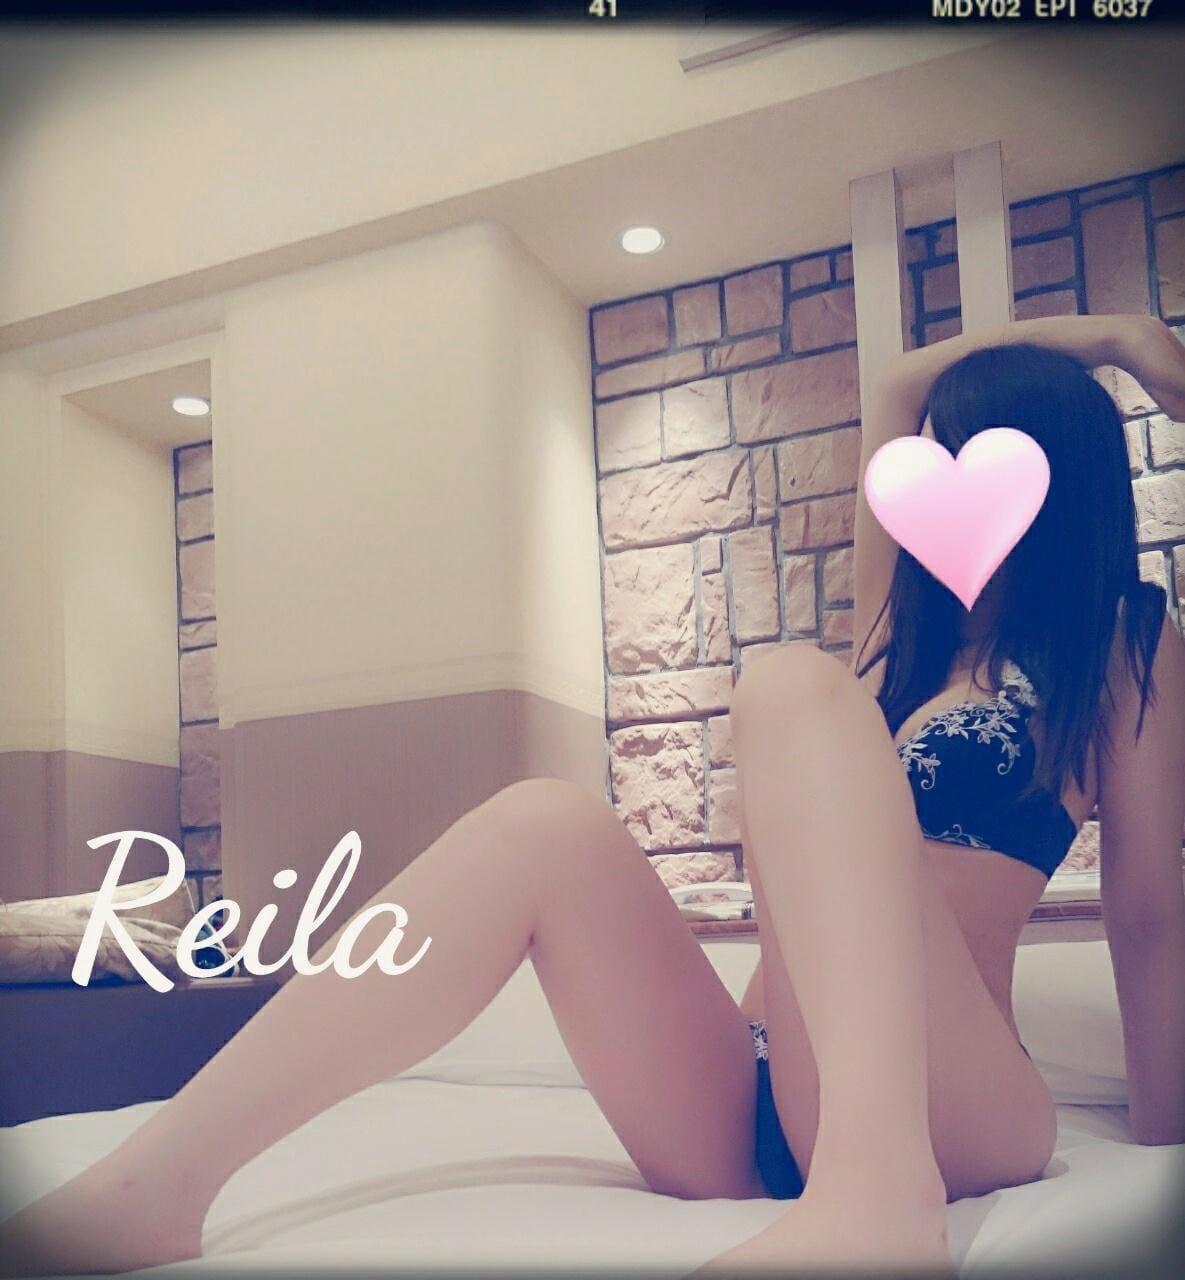 「reila.」06/16(06/16) 18:23 | レイラの写メ・風俗動画